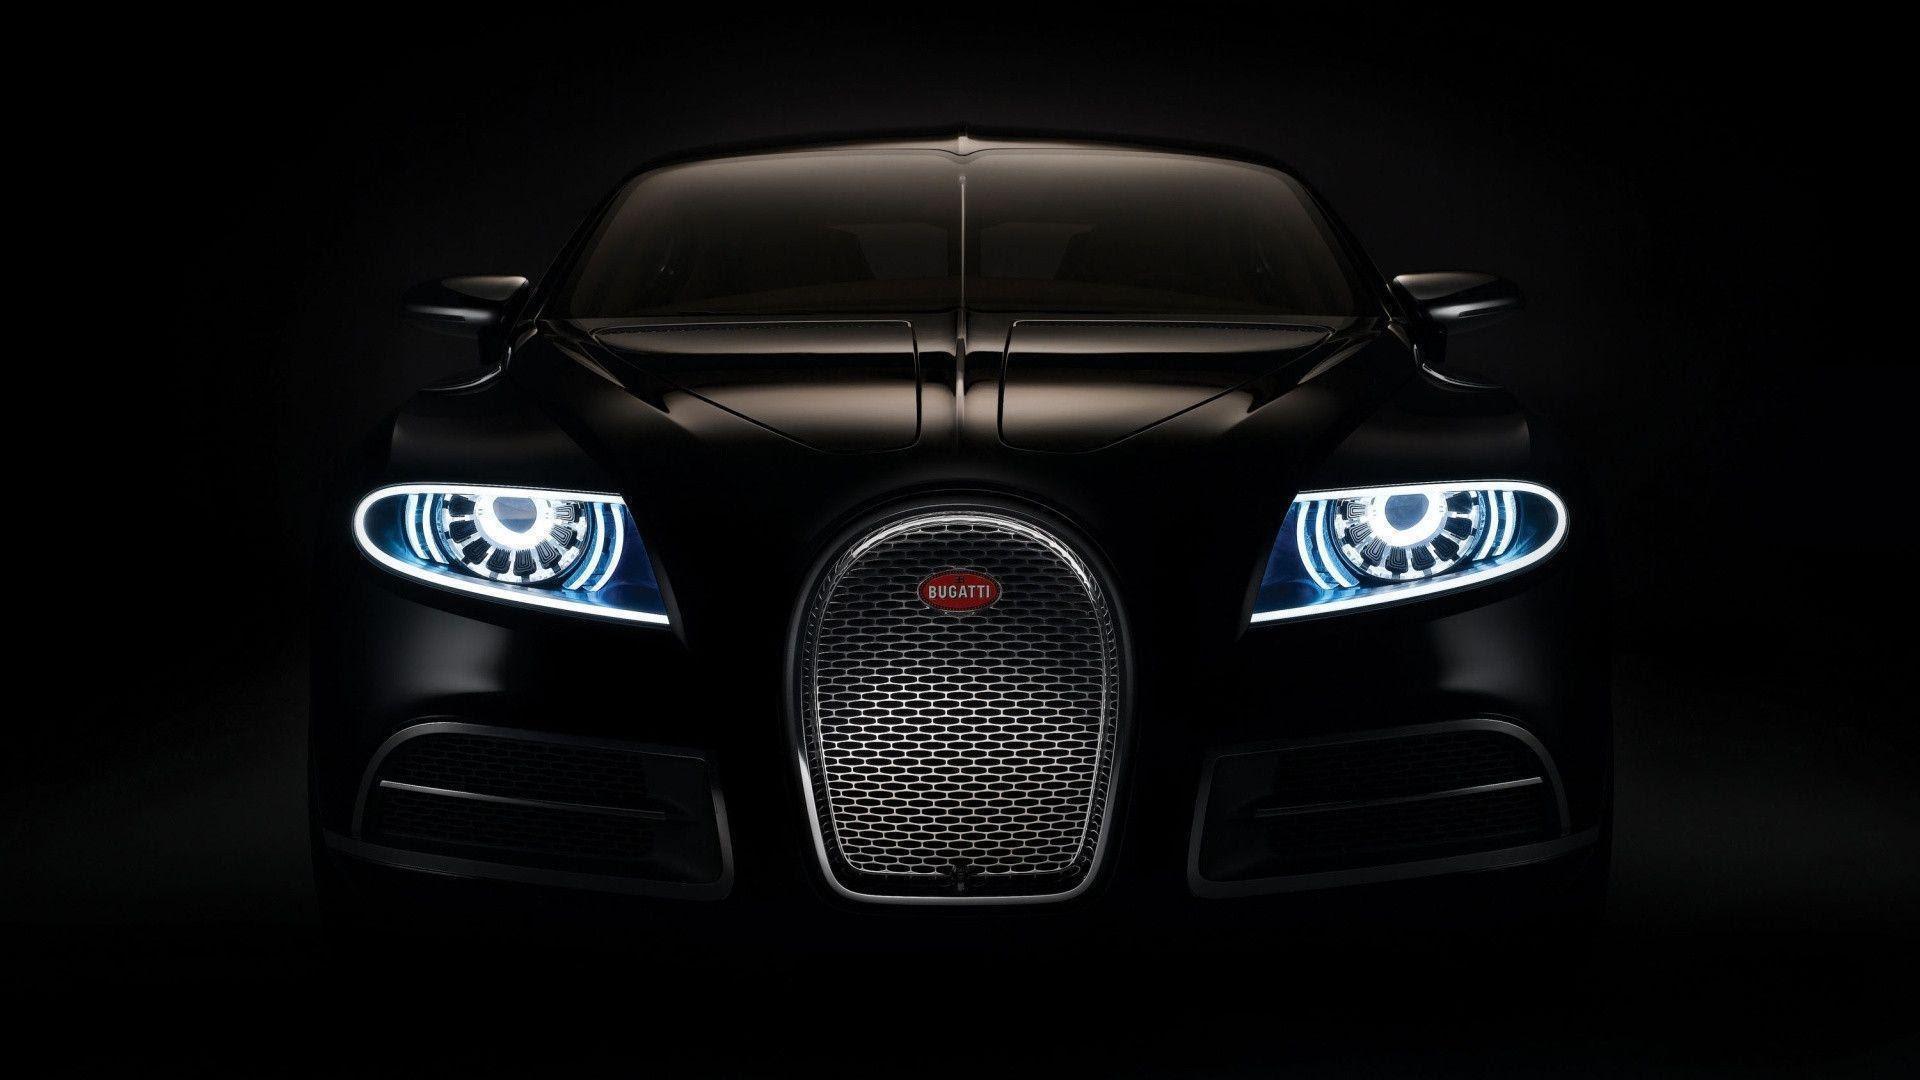 Bugatti Veyron Wallpapers HD Wallpaper Cave